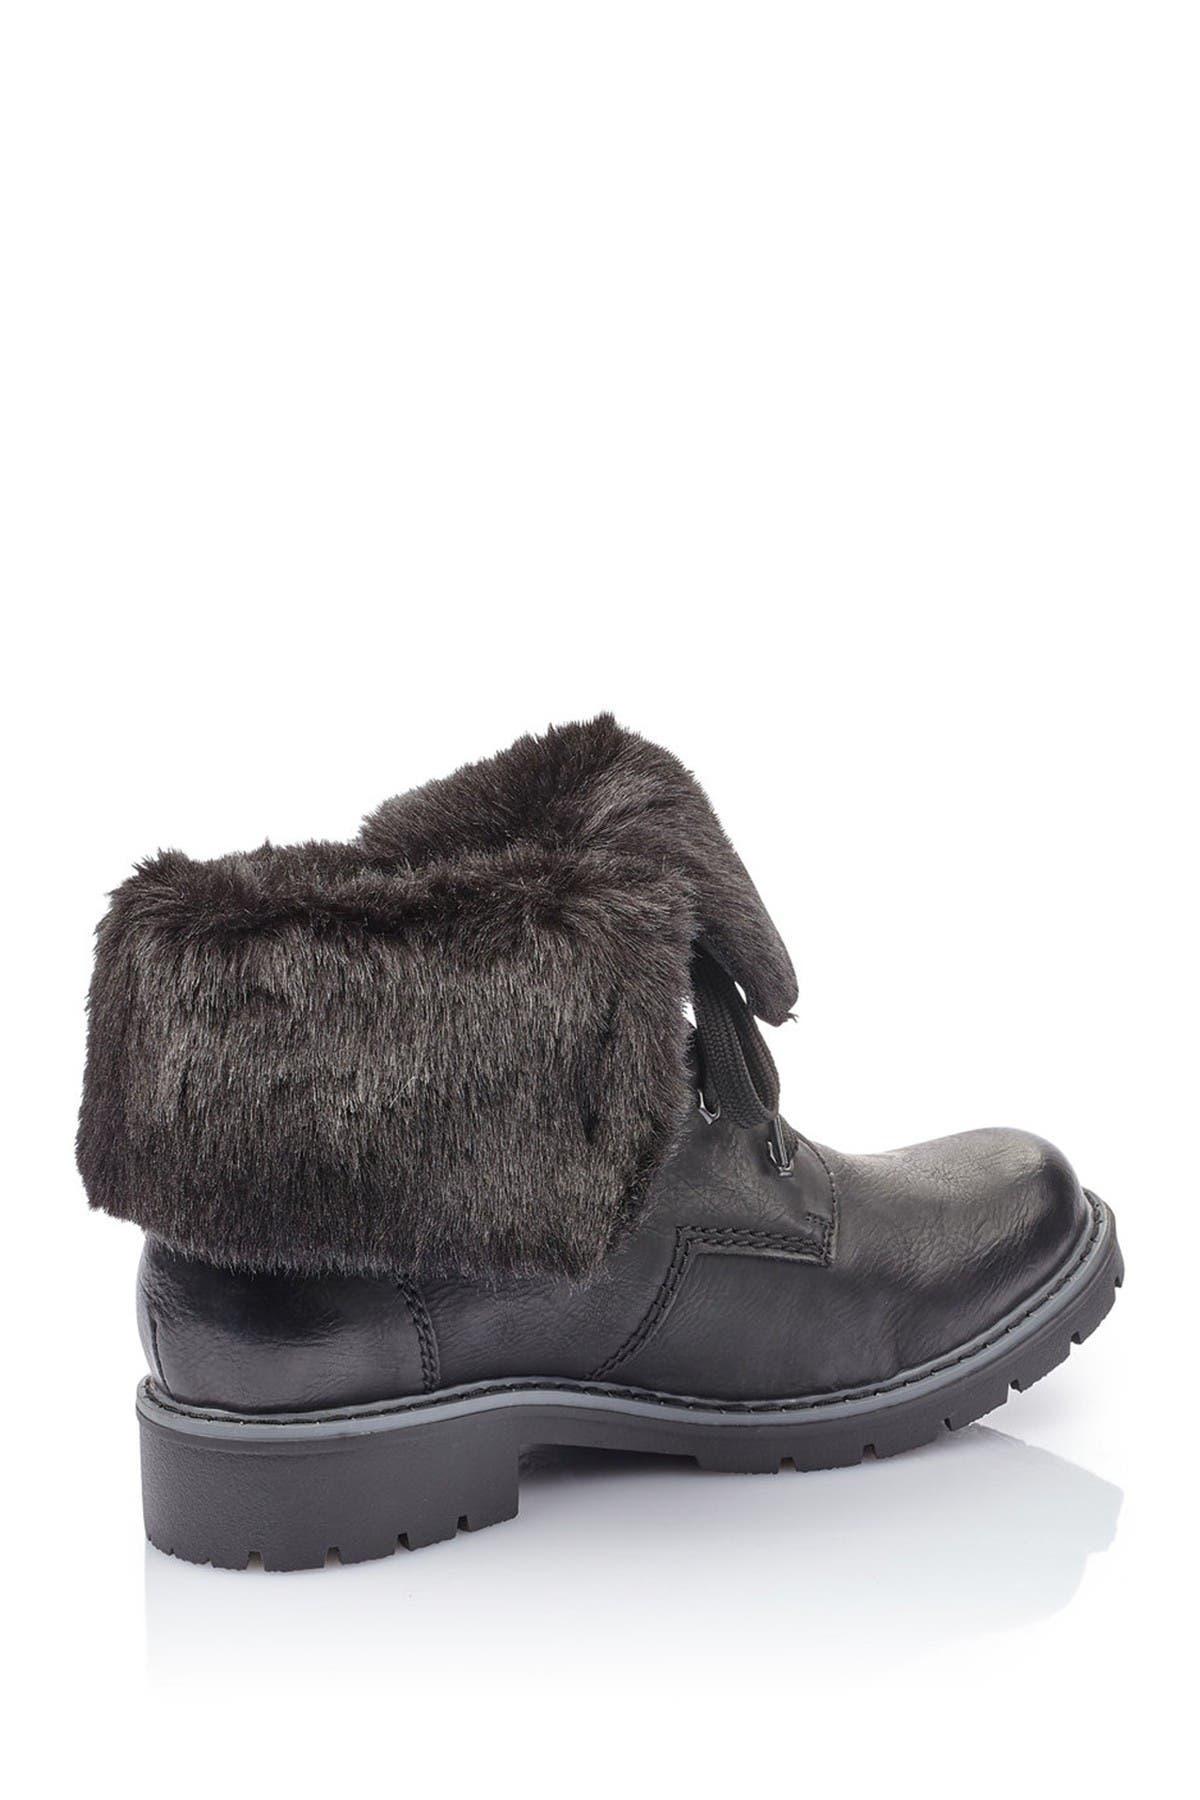 Image of Rieker Sabrina Genuine Lambs Wool Lined Boot